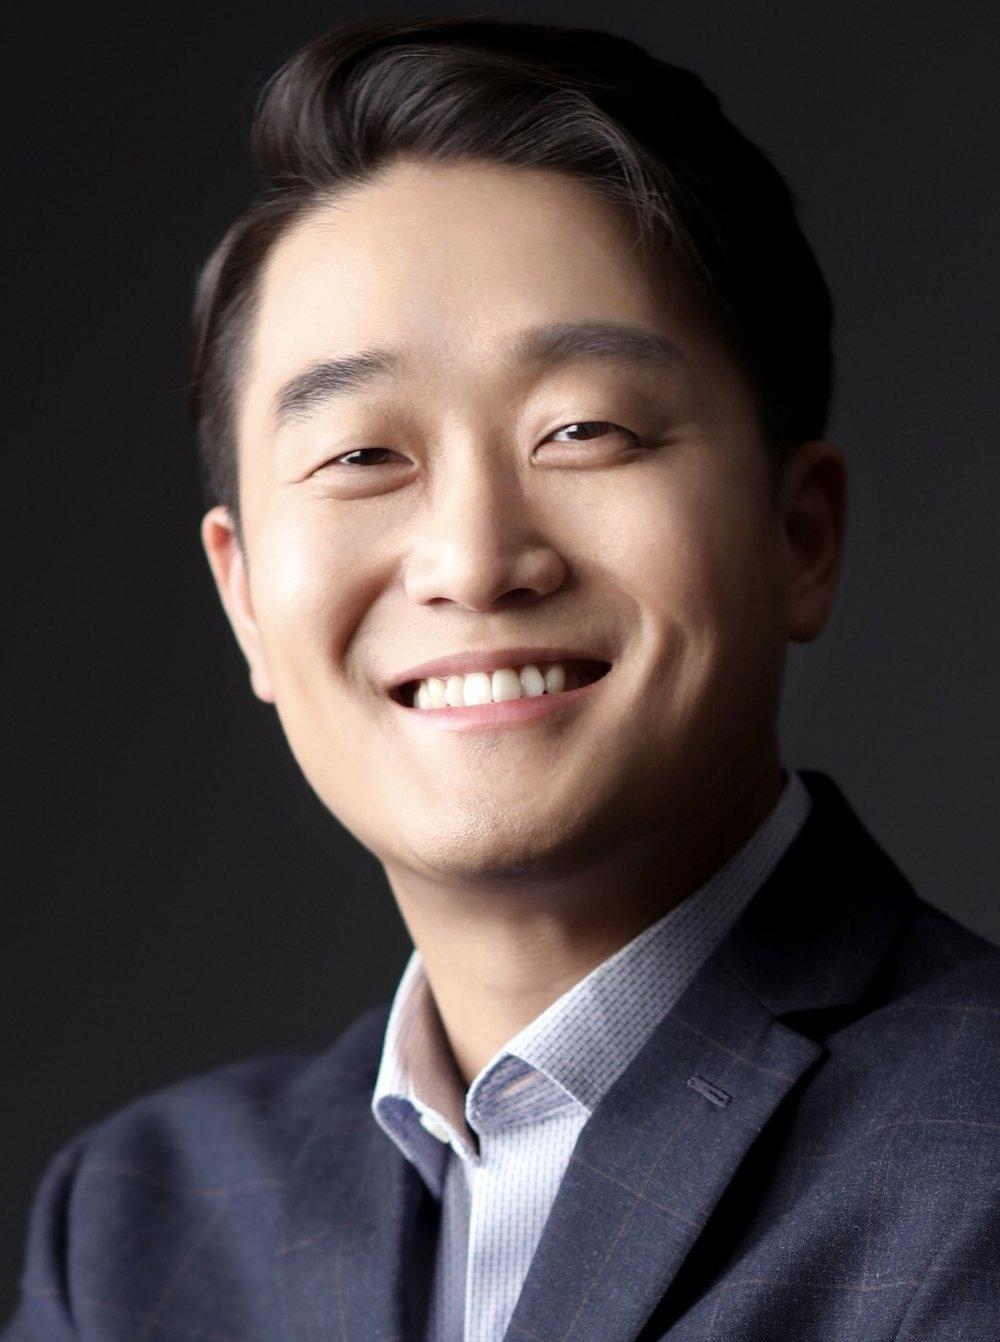 headshot1 - Joseph Han.jpeg